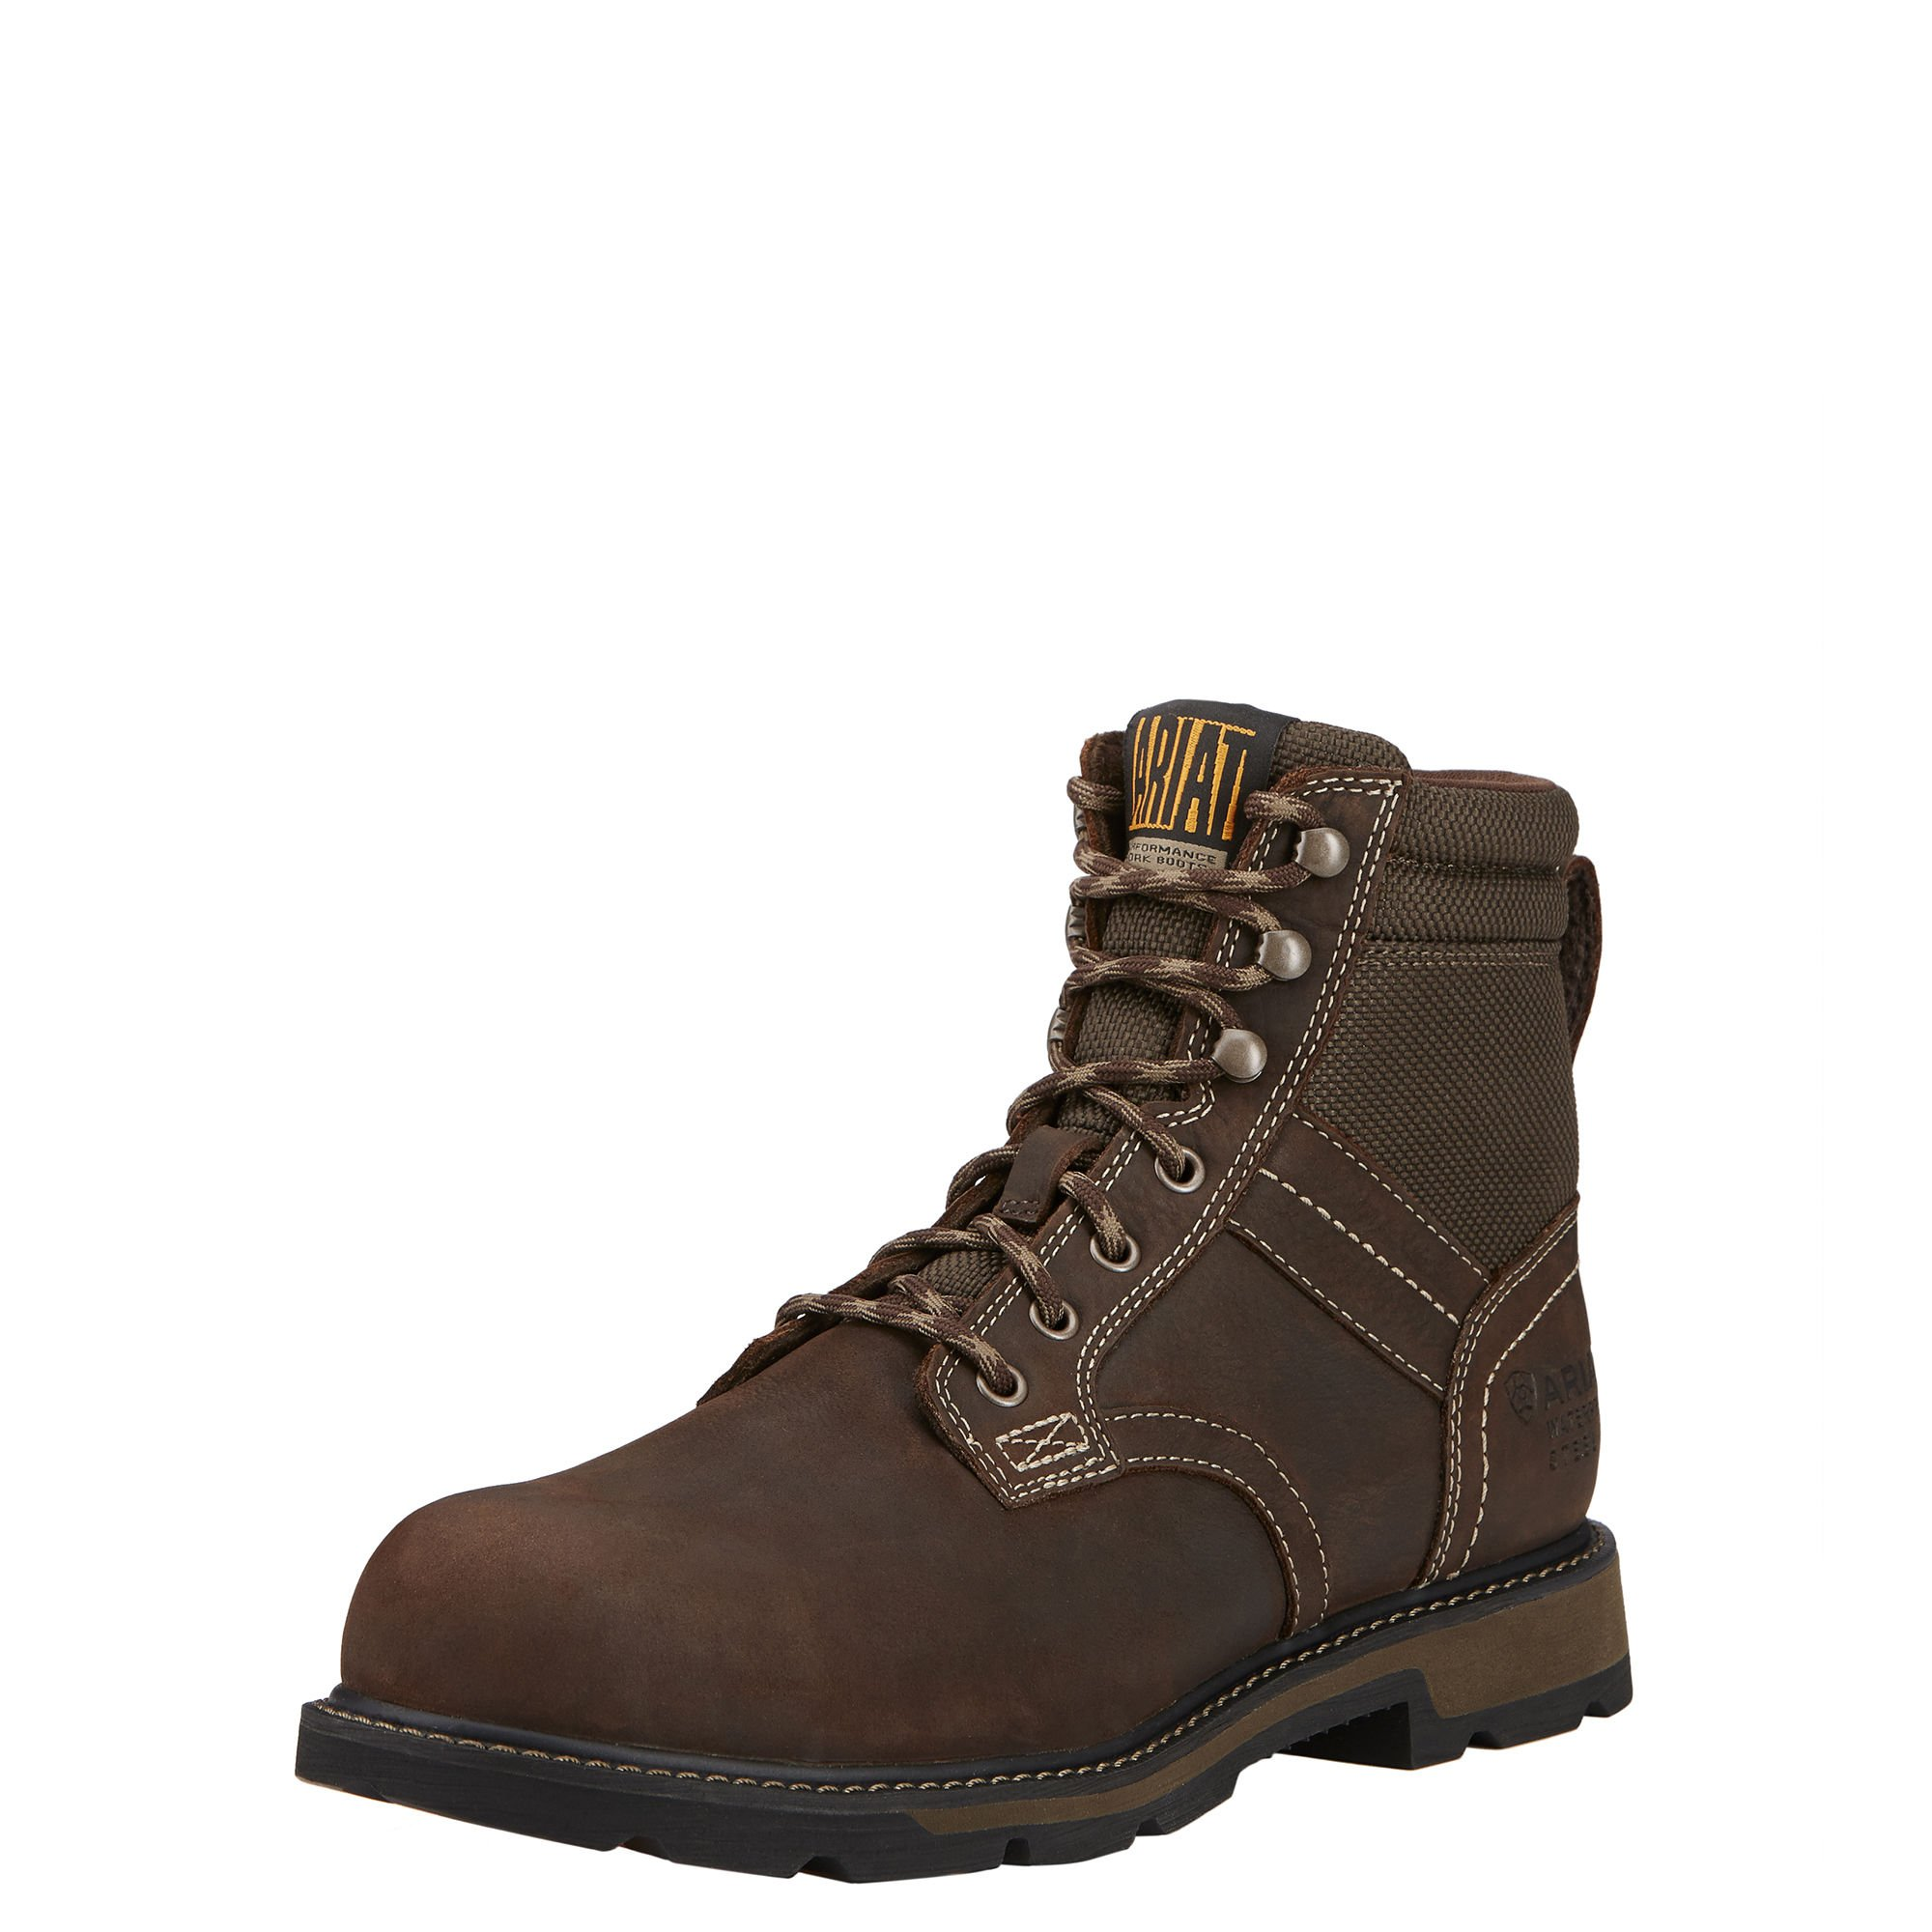 Ariat Men's Groundbreaker 6'' H2O Steel Toe Work Boot, Dark Brown/Dark Olive Cordura, 11 D US